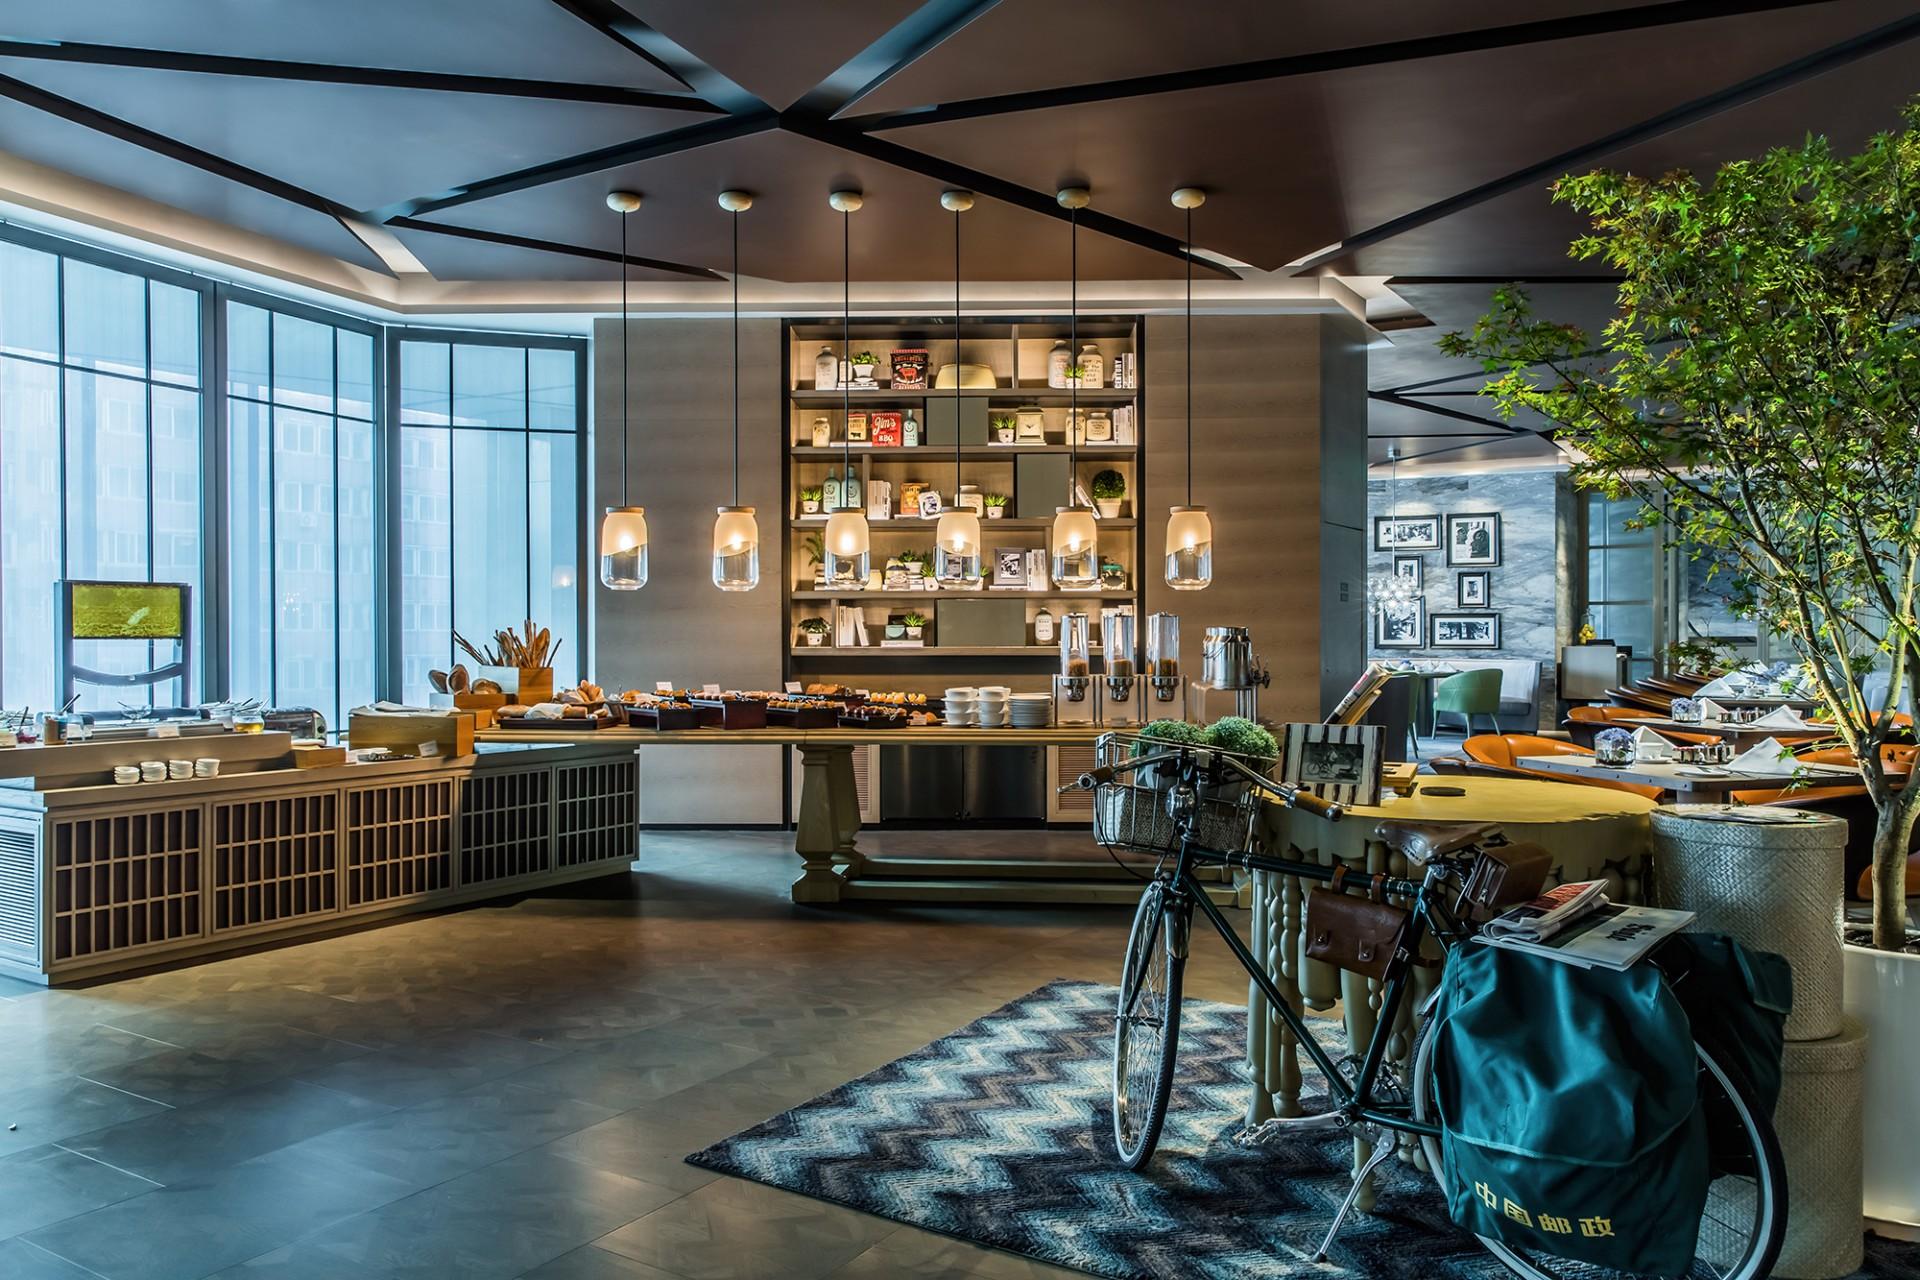 New Yuppies – Intercontinental Beijing Sanlitun by Cheng Chung Design